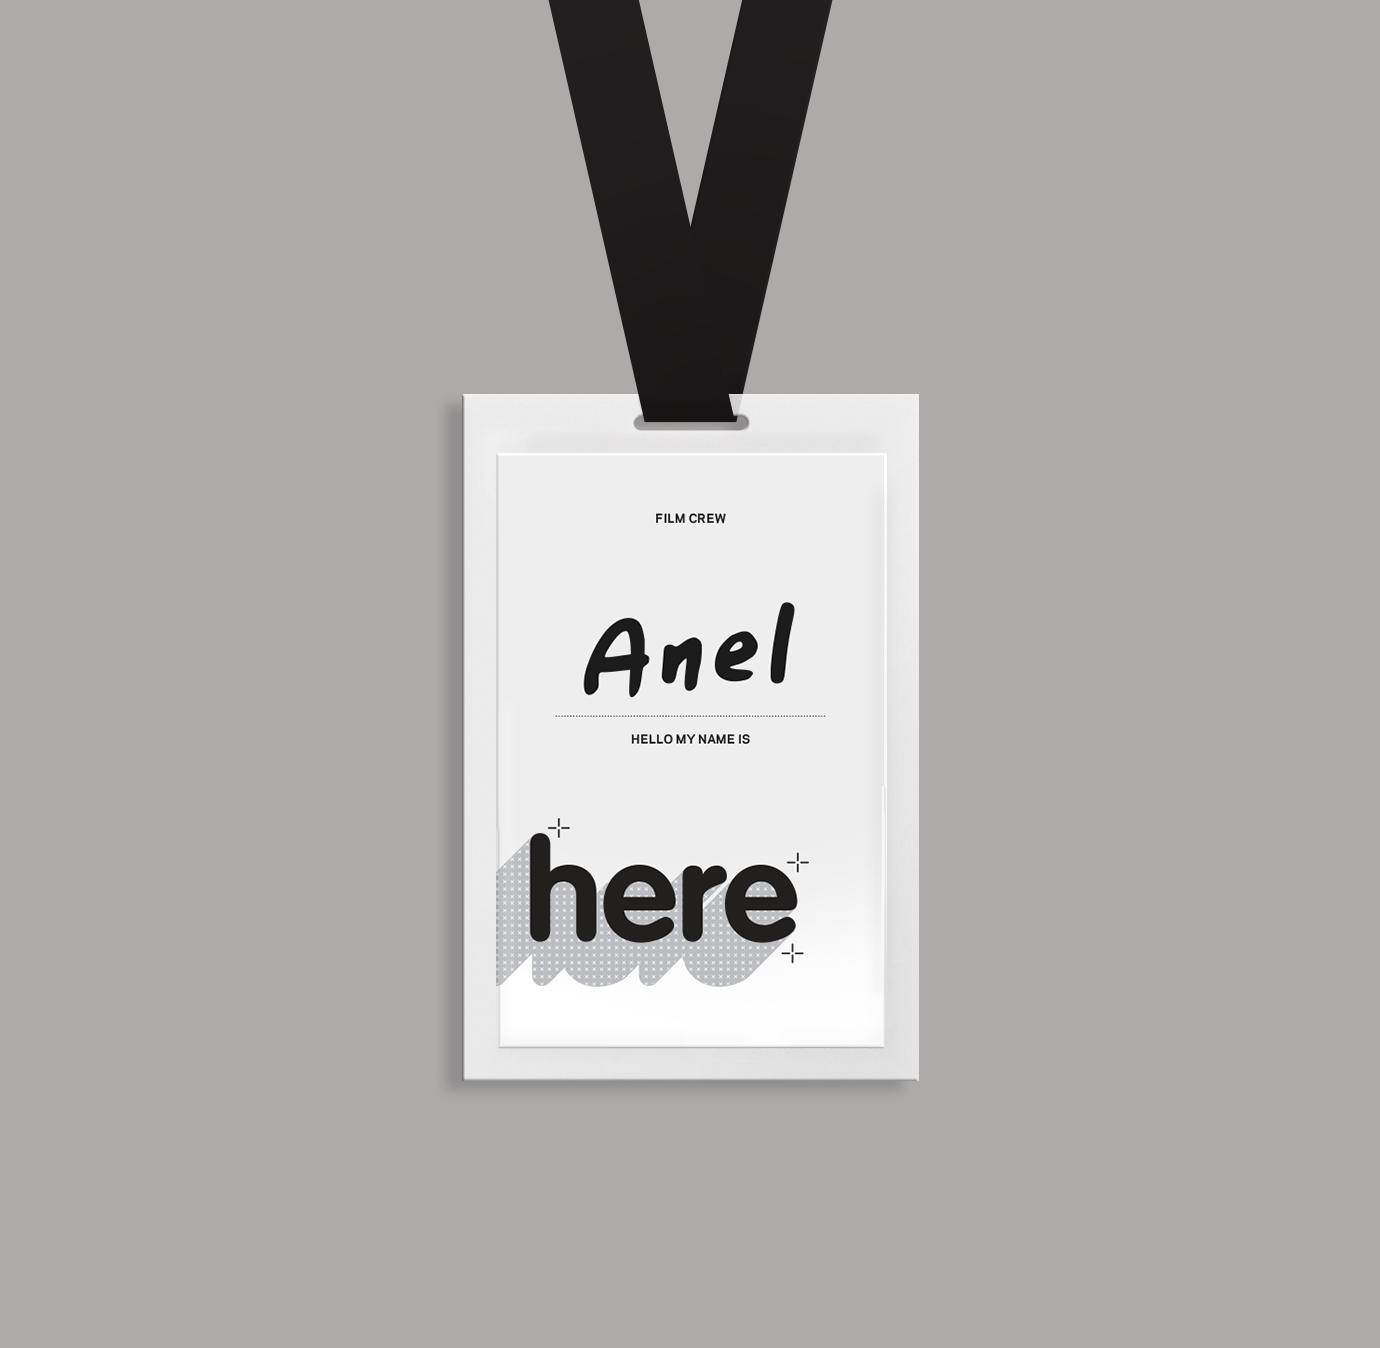 card-id-Here-studio-yoenpaperland